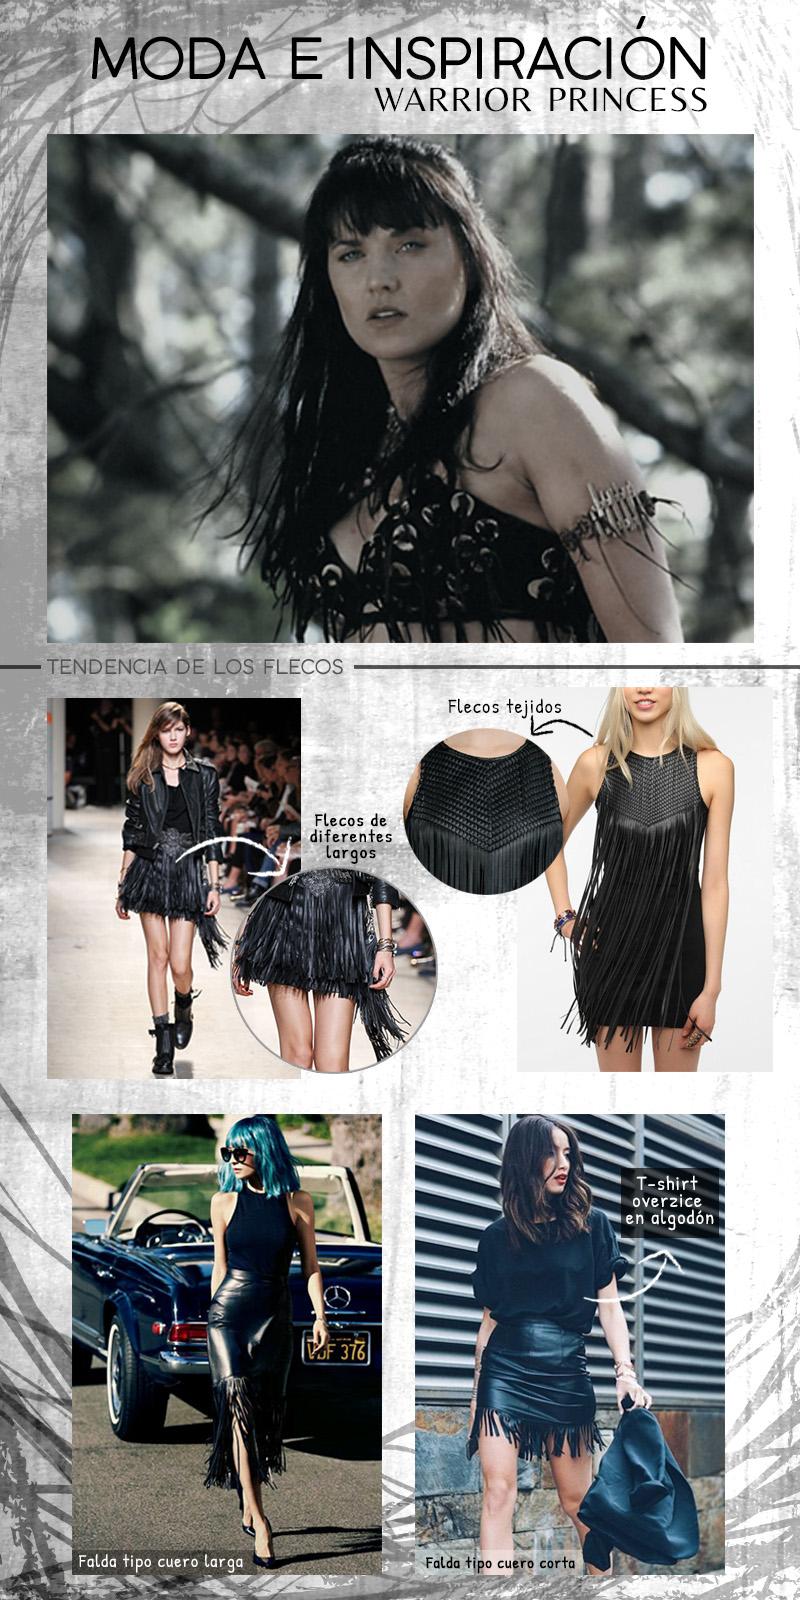 Moda y estilo oscuro inspirado en Warrior Princess XENA